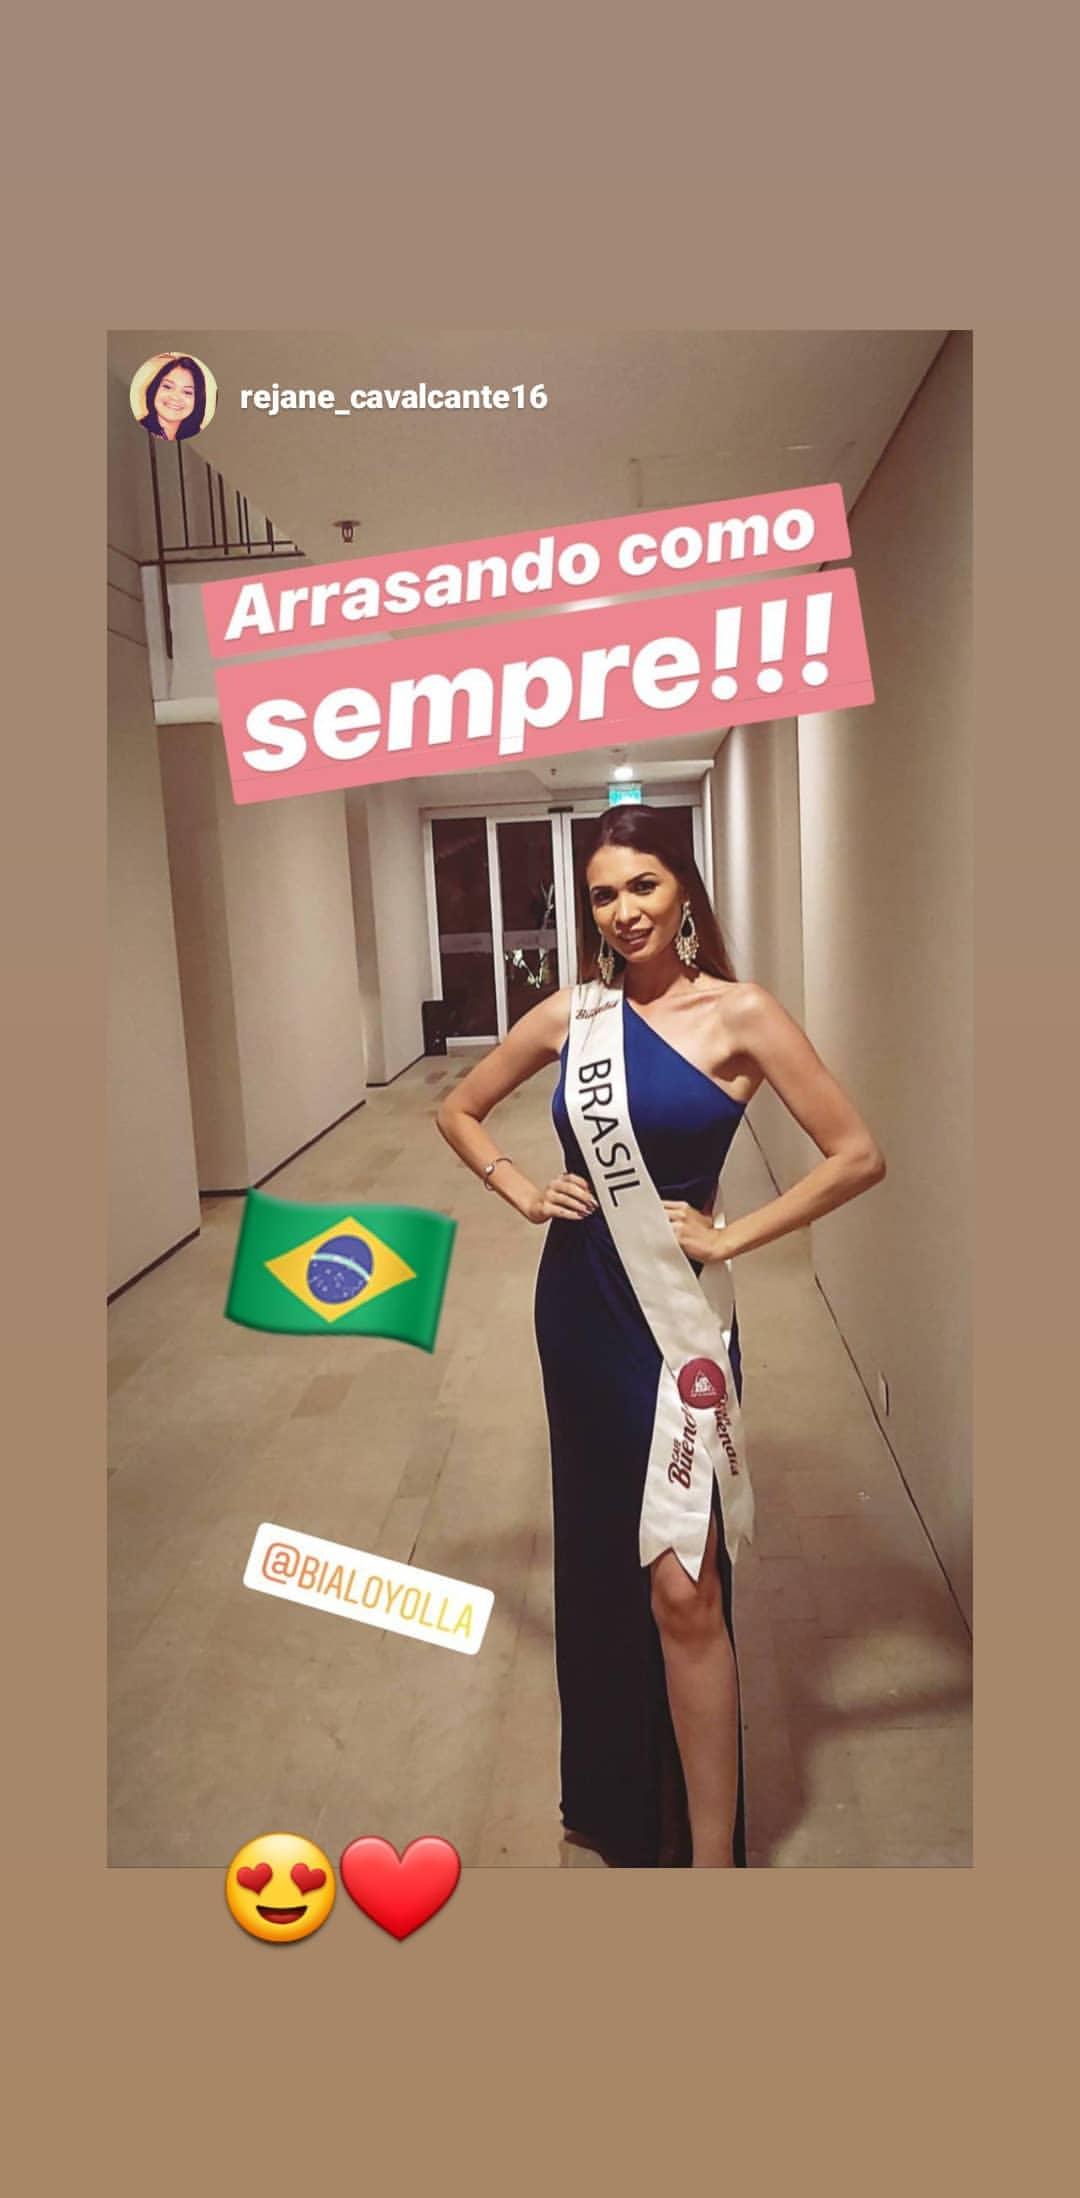 bianca loyola, miss brasil cafe 2020. - Página 2 82590610